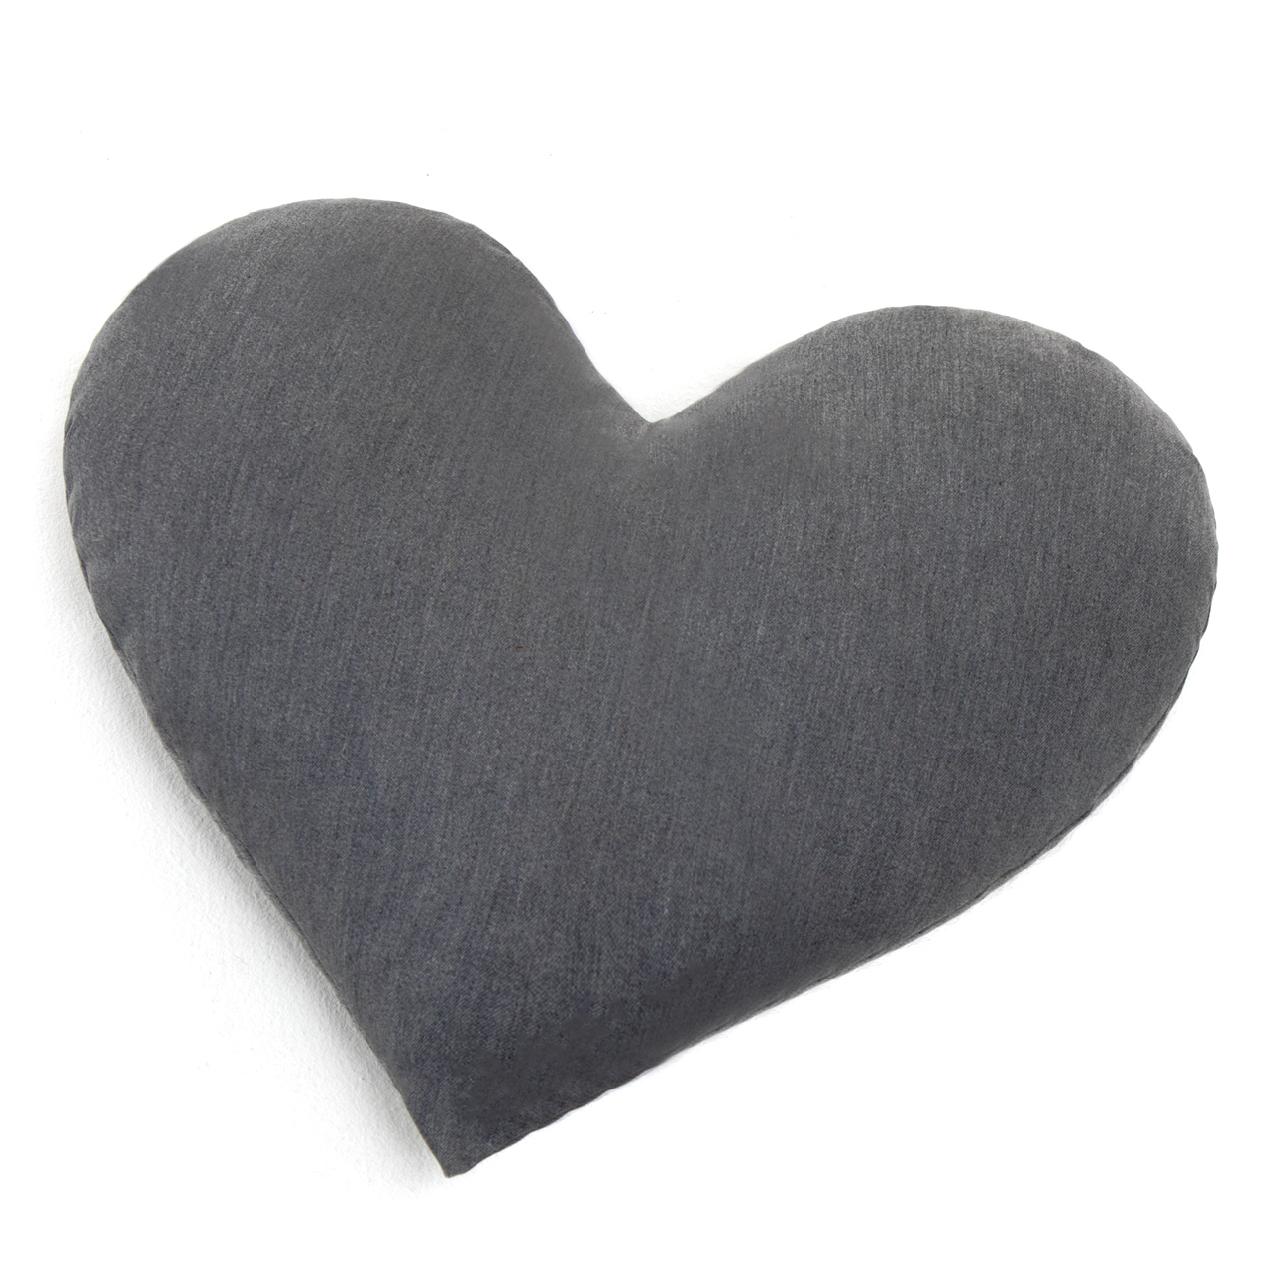 Toy Heart one size grau